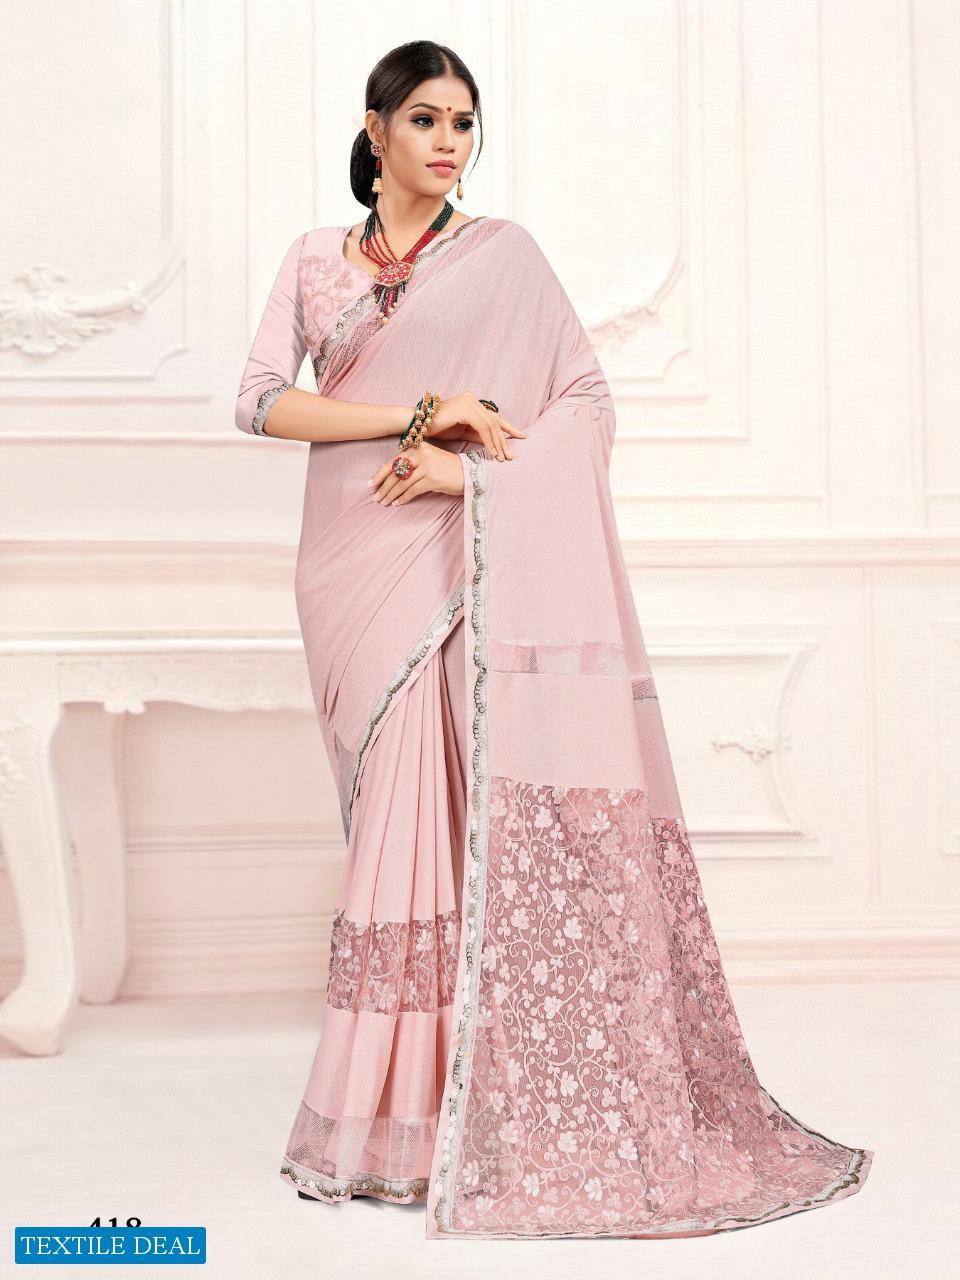 Mehek 401 To 420 Series Wholesale Fancy Indian Sarees